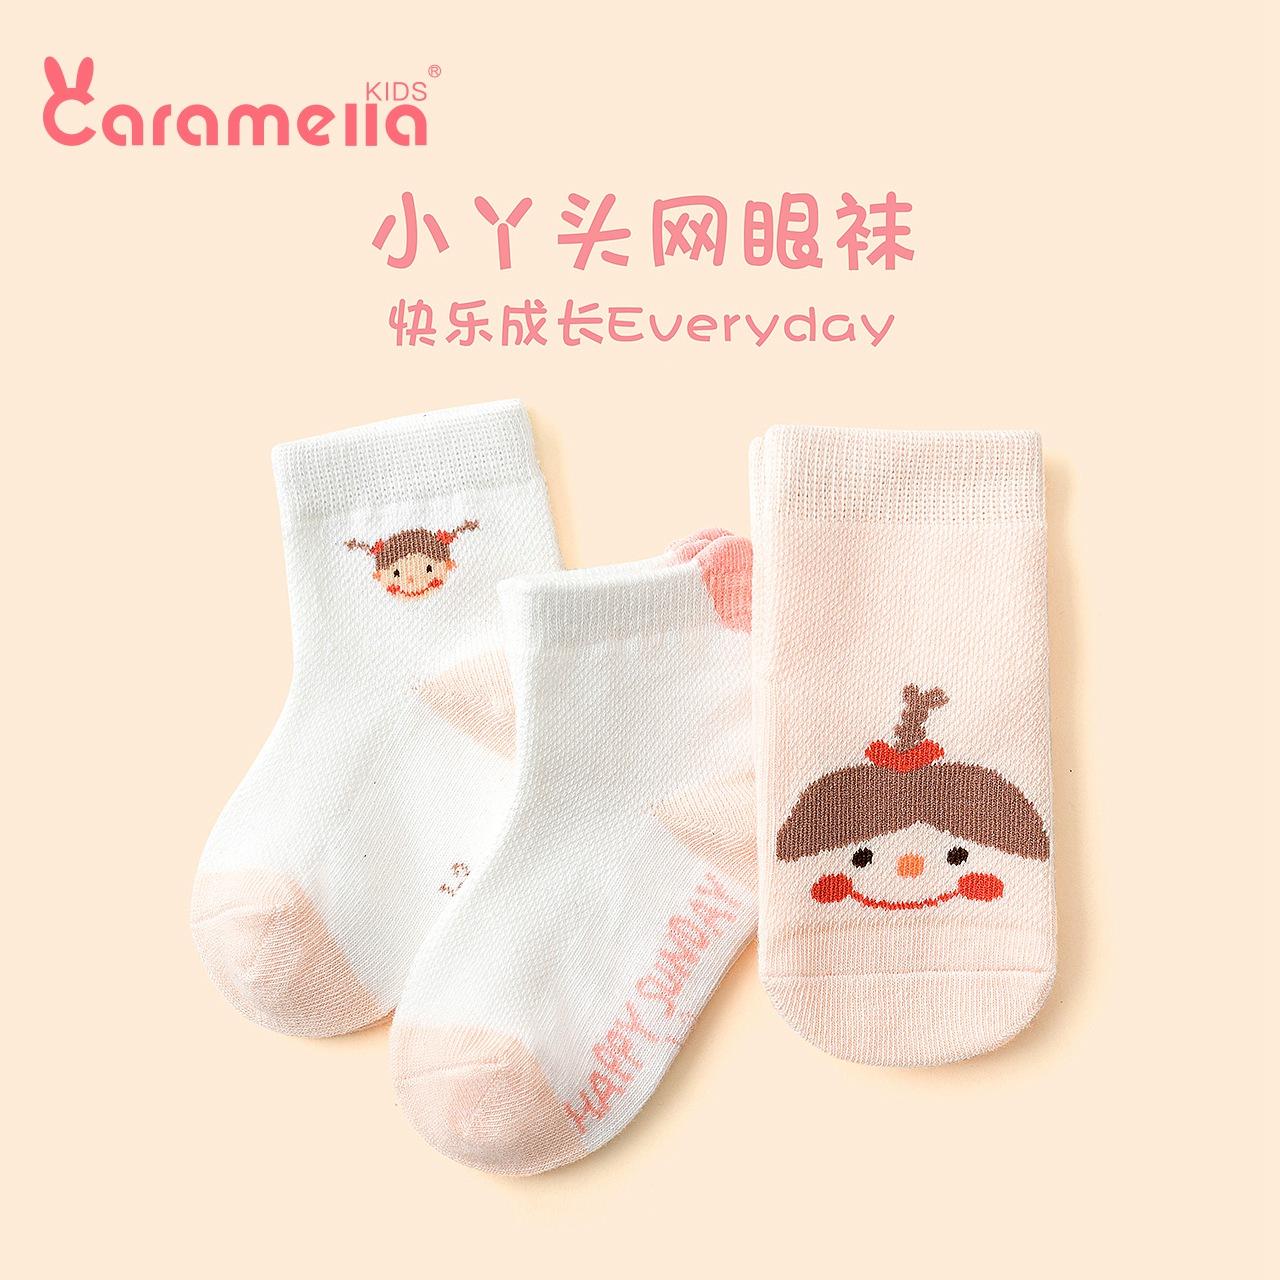 caramella儿童袜子纯棉春夏薄款网眼袜新生婴儿男女童宝宝袜短袜